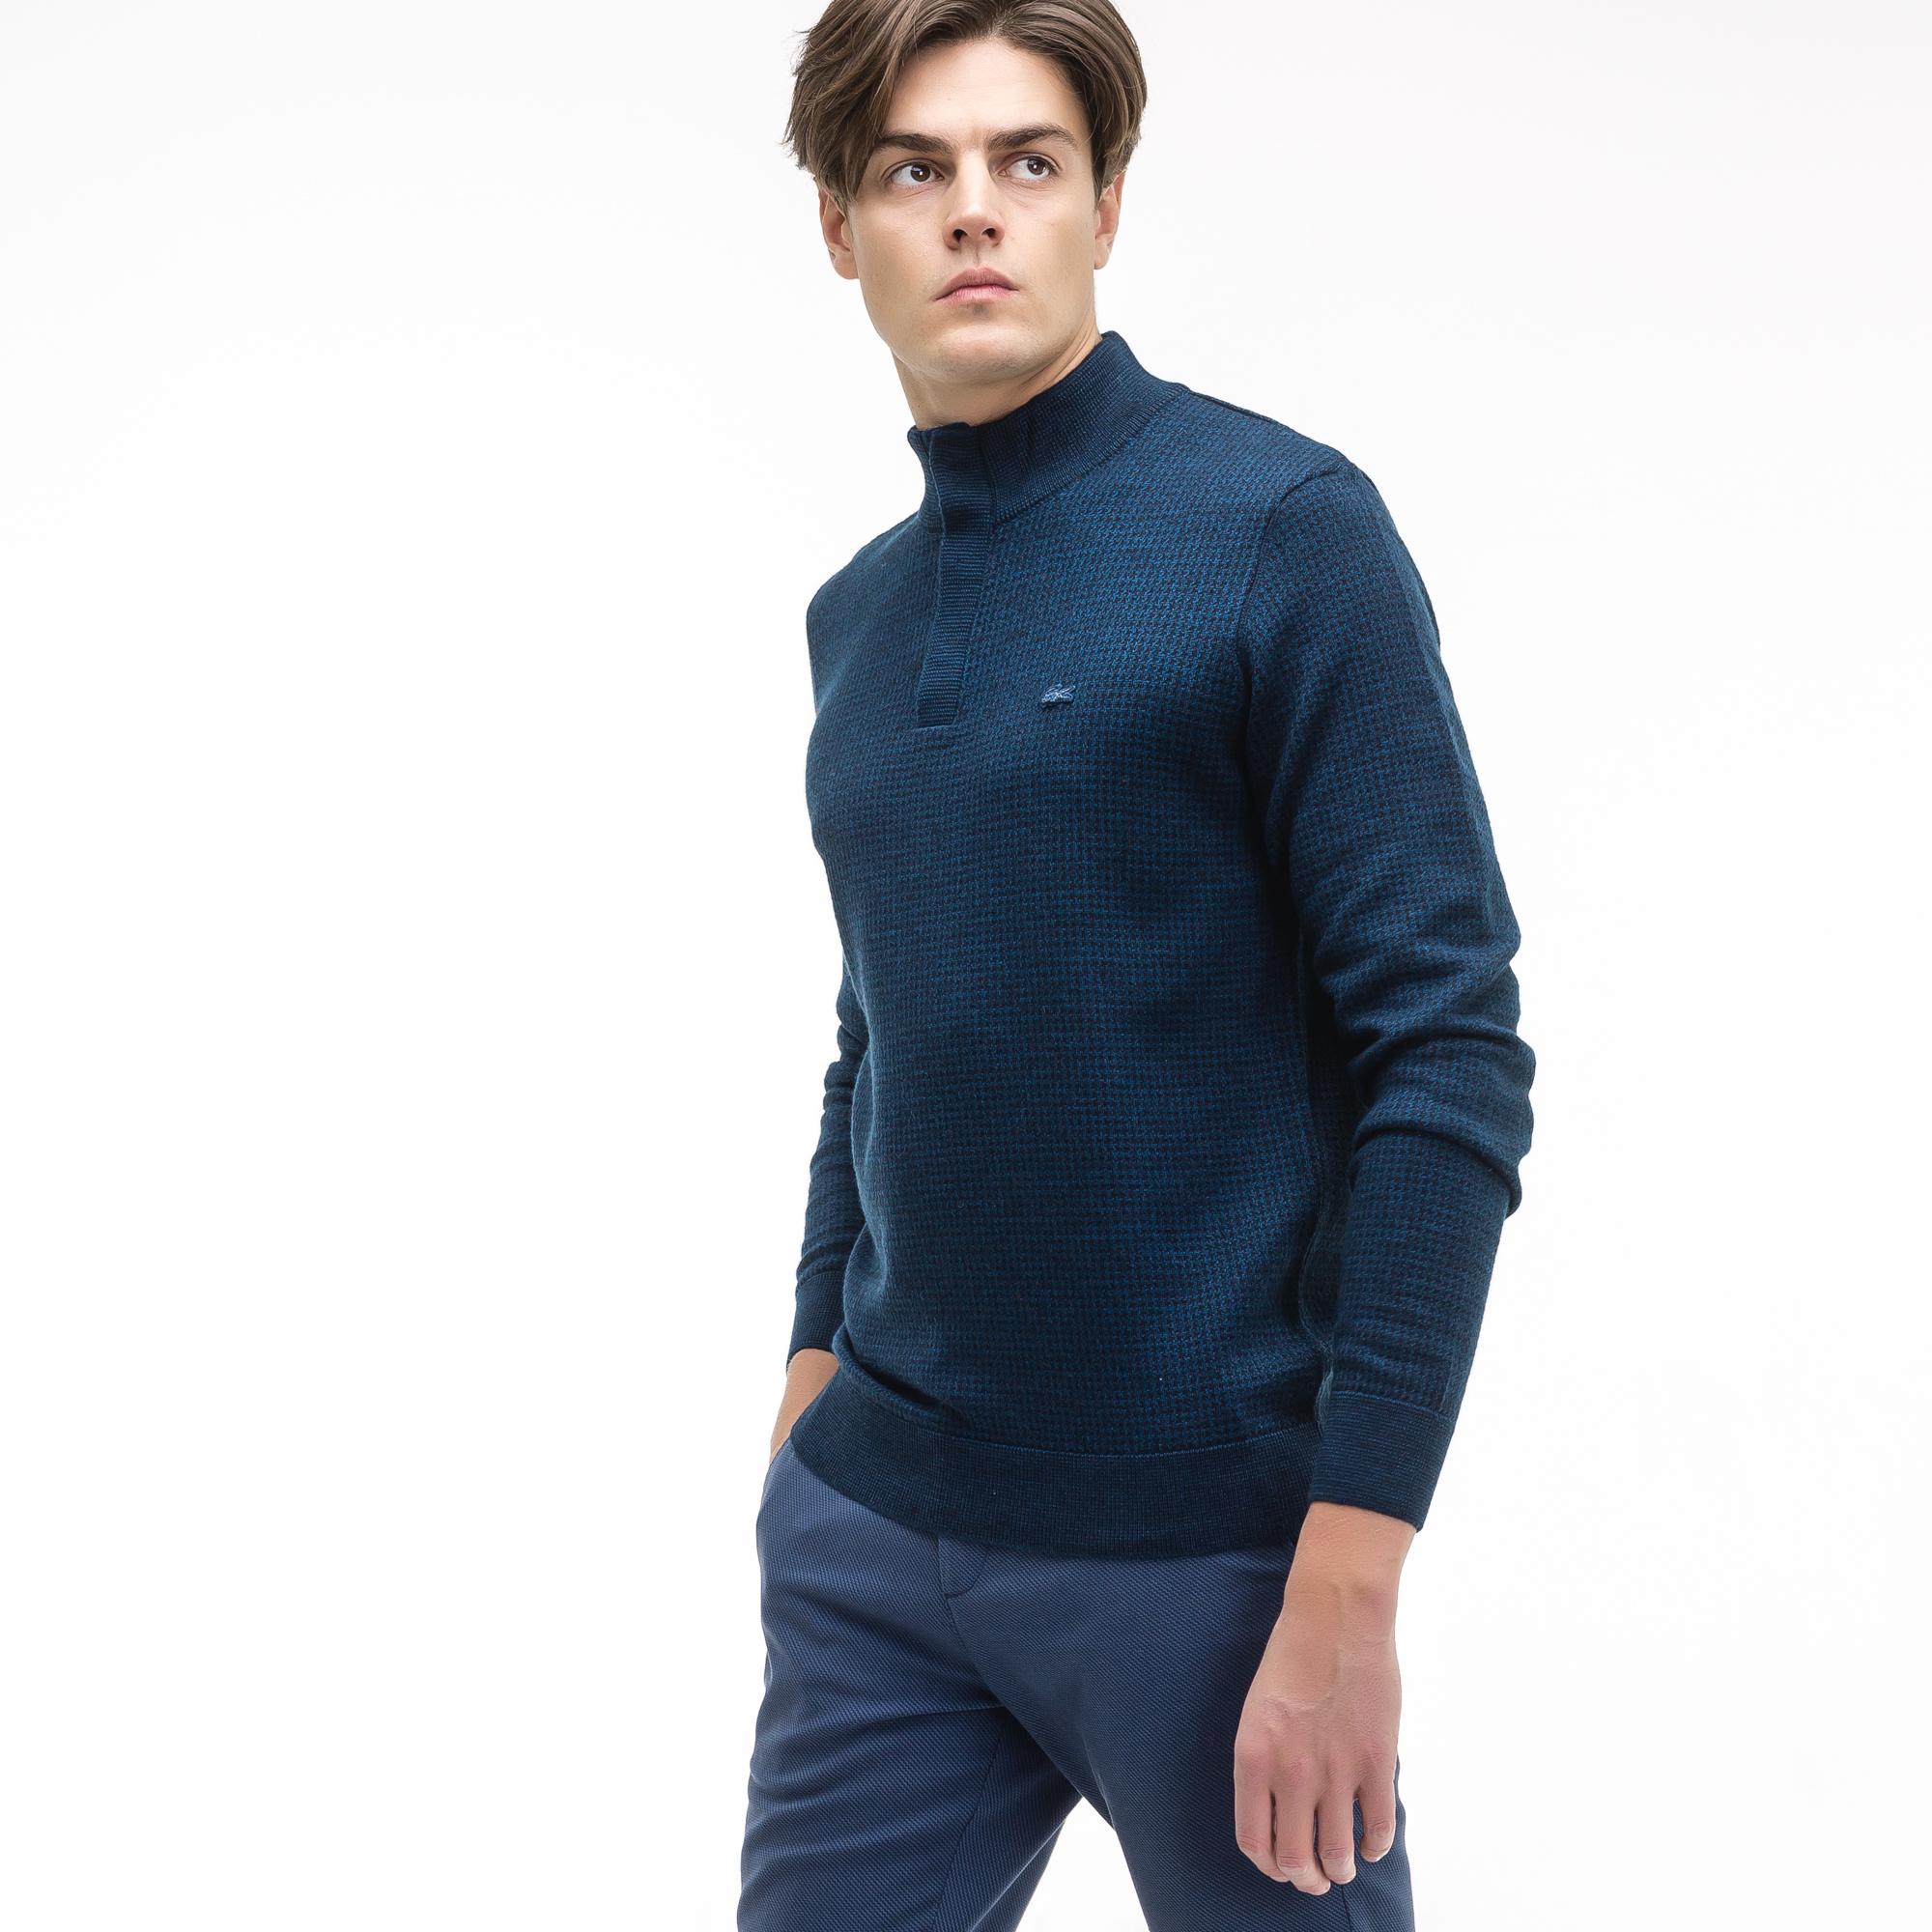 Фото 3 - Мужской свитер Lacoste темно-синего цвета